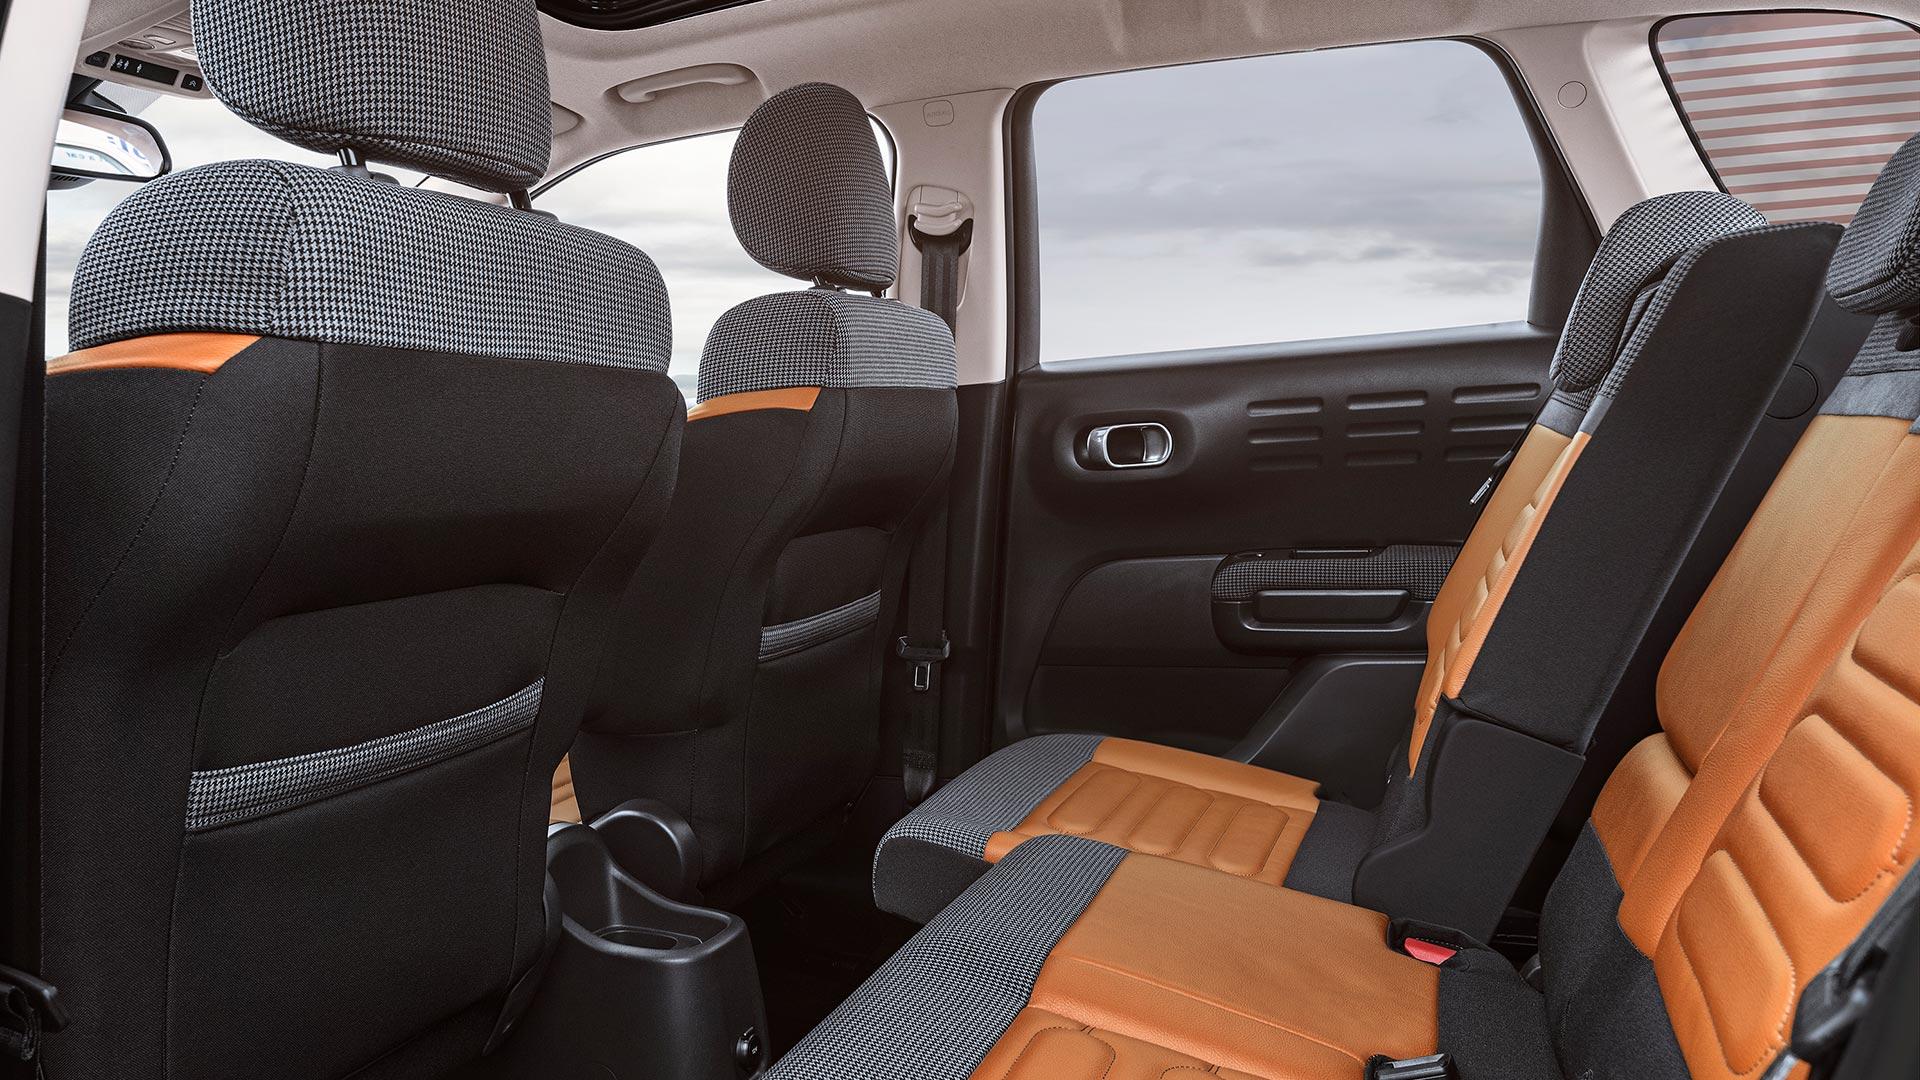 Отделка салона Citroen C3 Aircross SUV